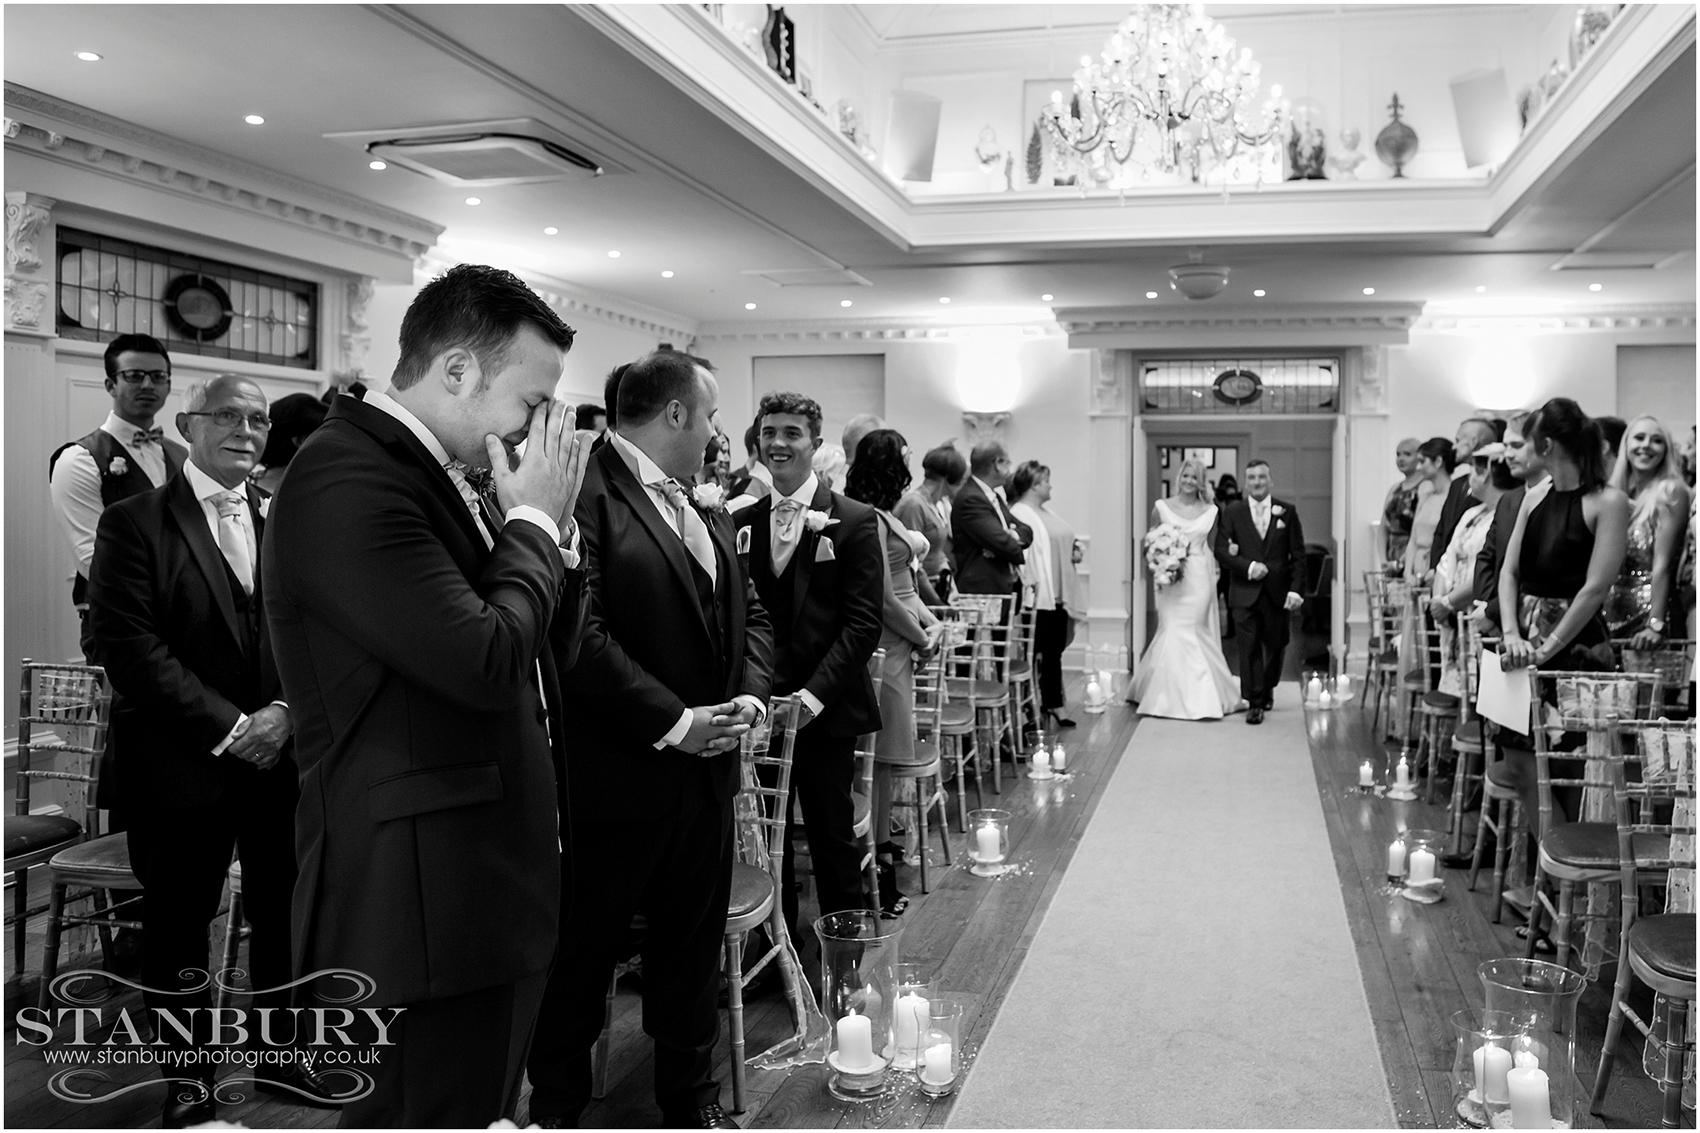 ashfield house hotel wedding photographers wigan stanbury wedding photography